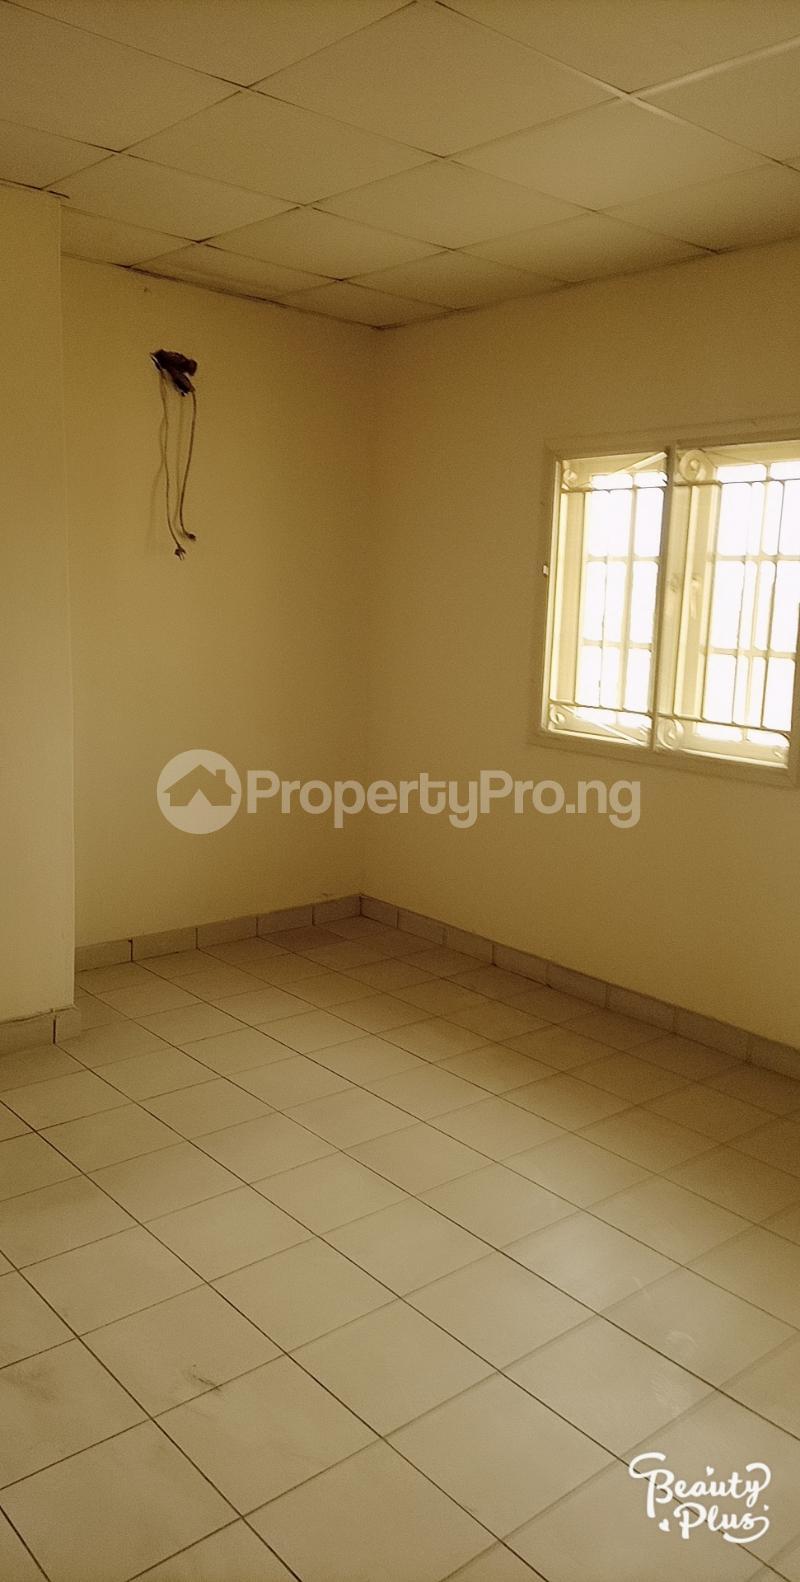 3 bedroom Flat / Apartment for rent Oke Afa isolo. Lagos Mainland Oke-Afa Isolo Lagos - 7